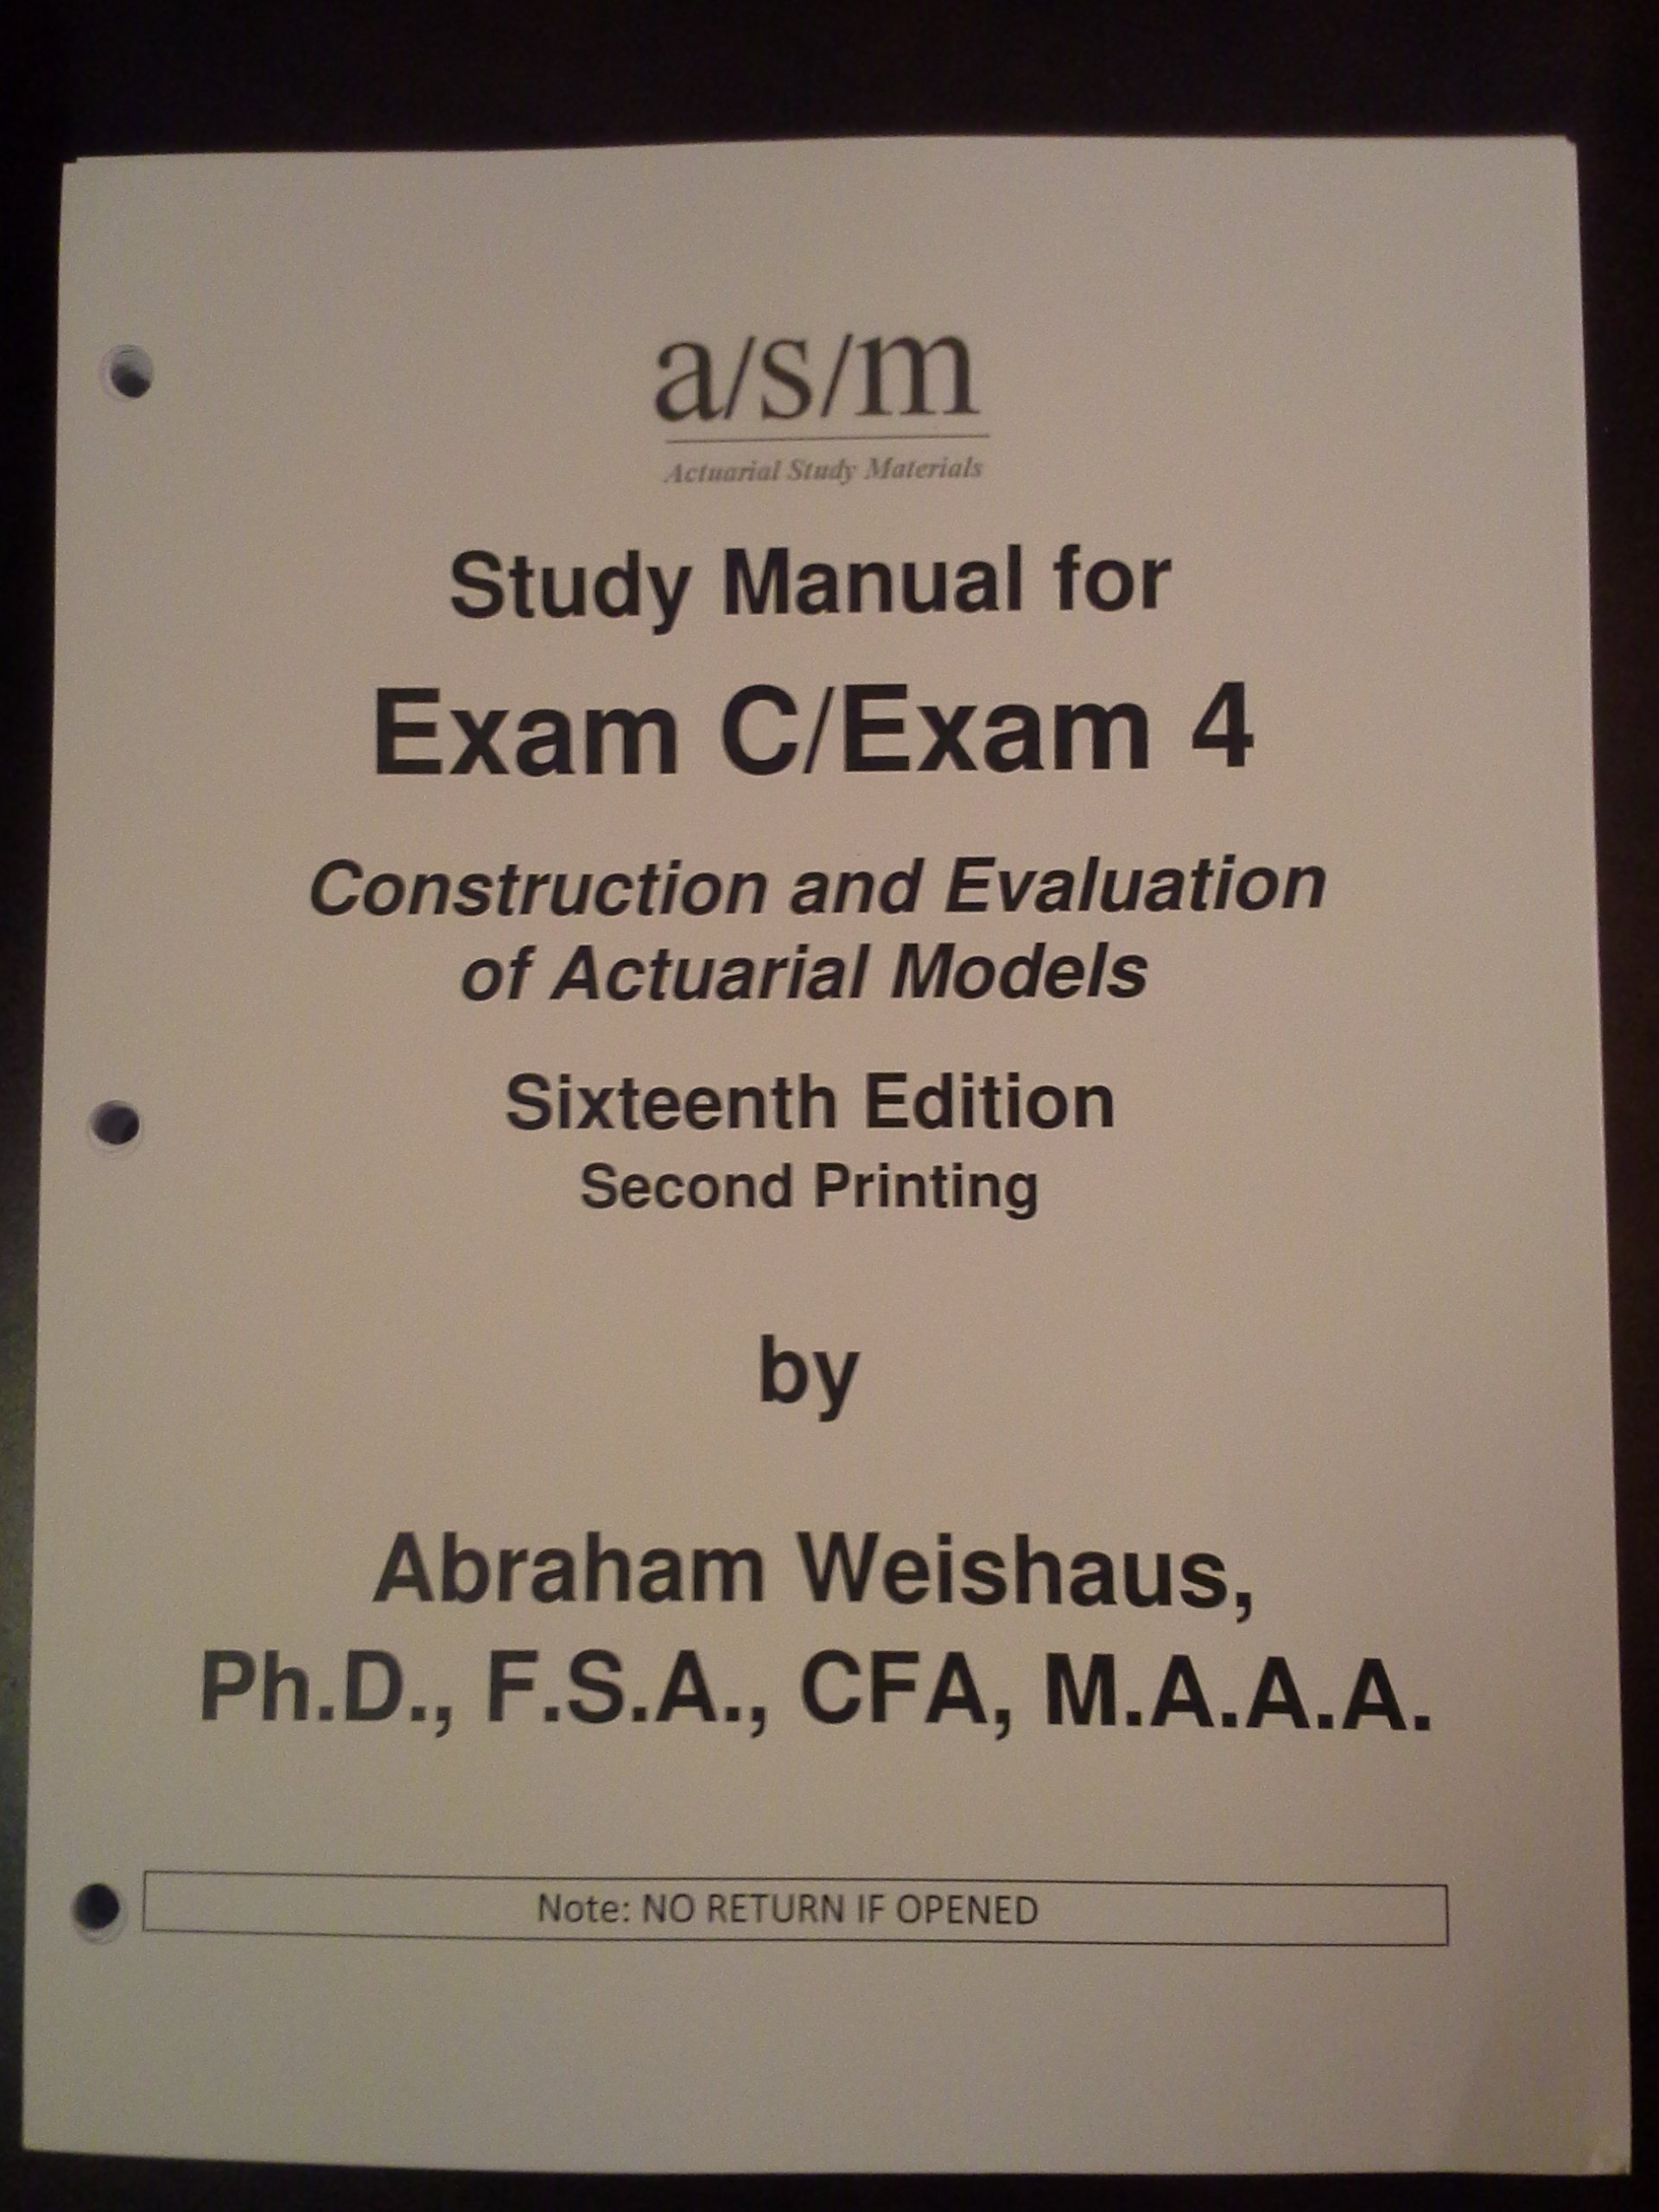 Actex Actuarial Study Manual SOA Exam C / CAS 4 (Volume 1 & 2) 2012 Edition  (Actuarial Exams): Abraham Weishaus: 9781566988964: Amazon.com: Books